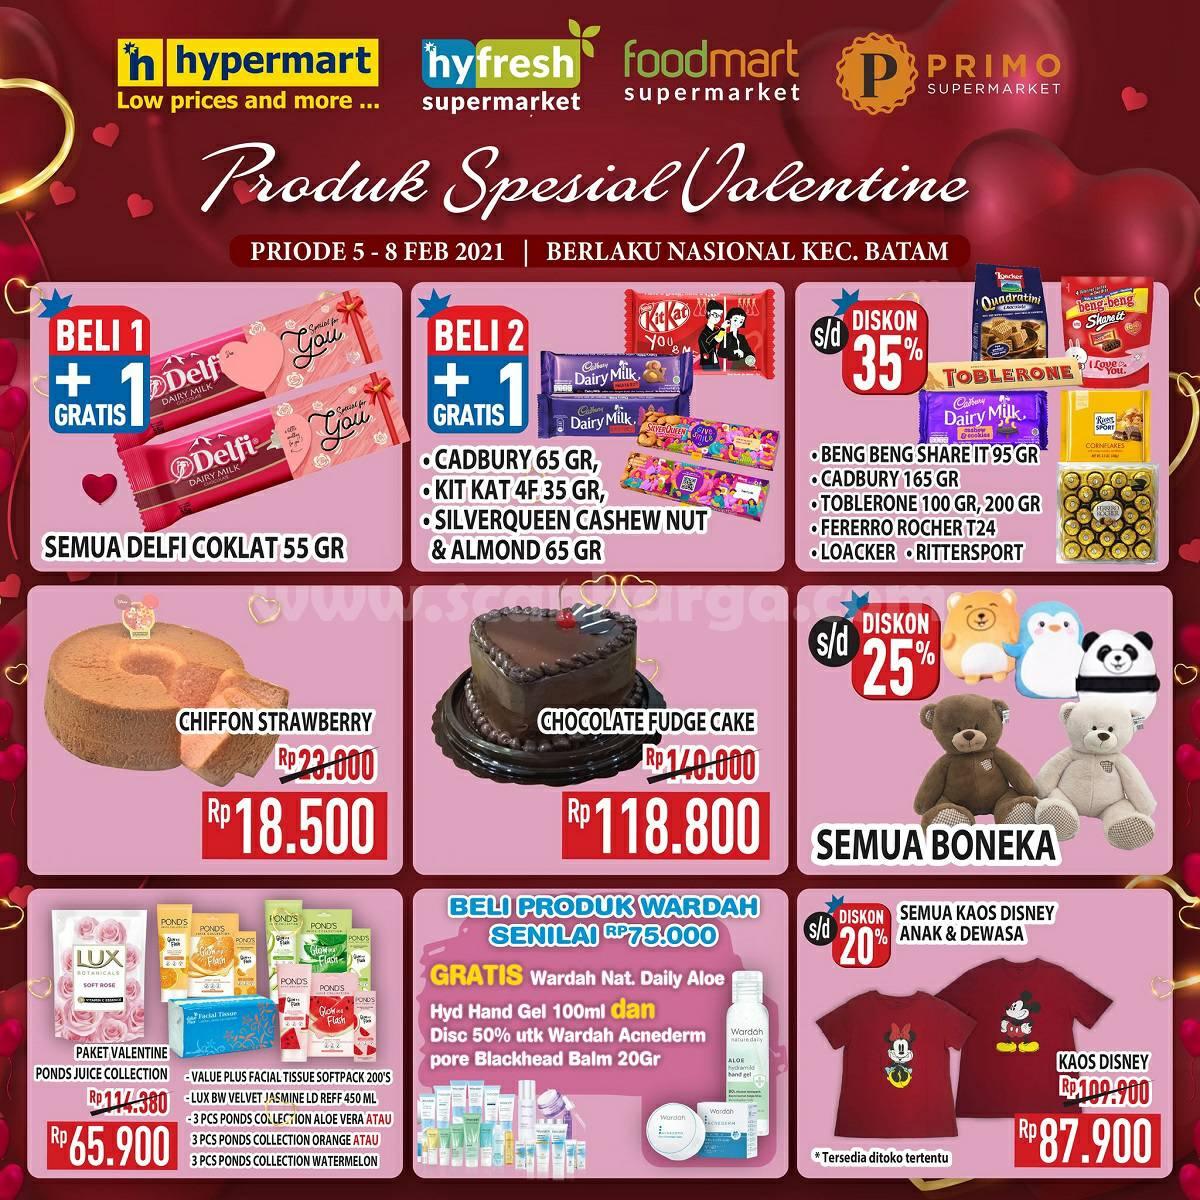 HYPERMART Promo Produk Spesial VALENTINE! Diskon hingga 35%